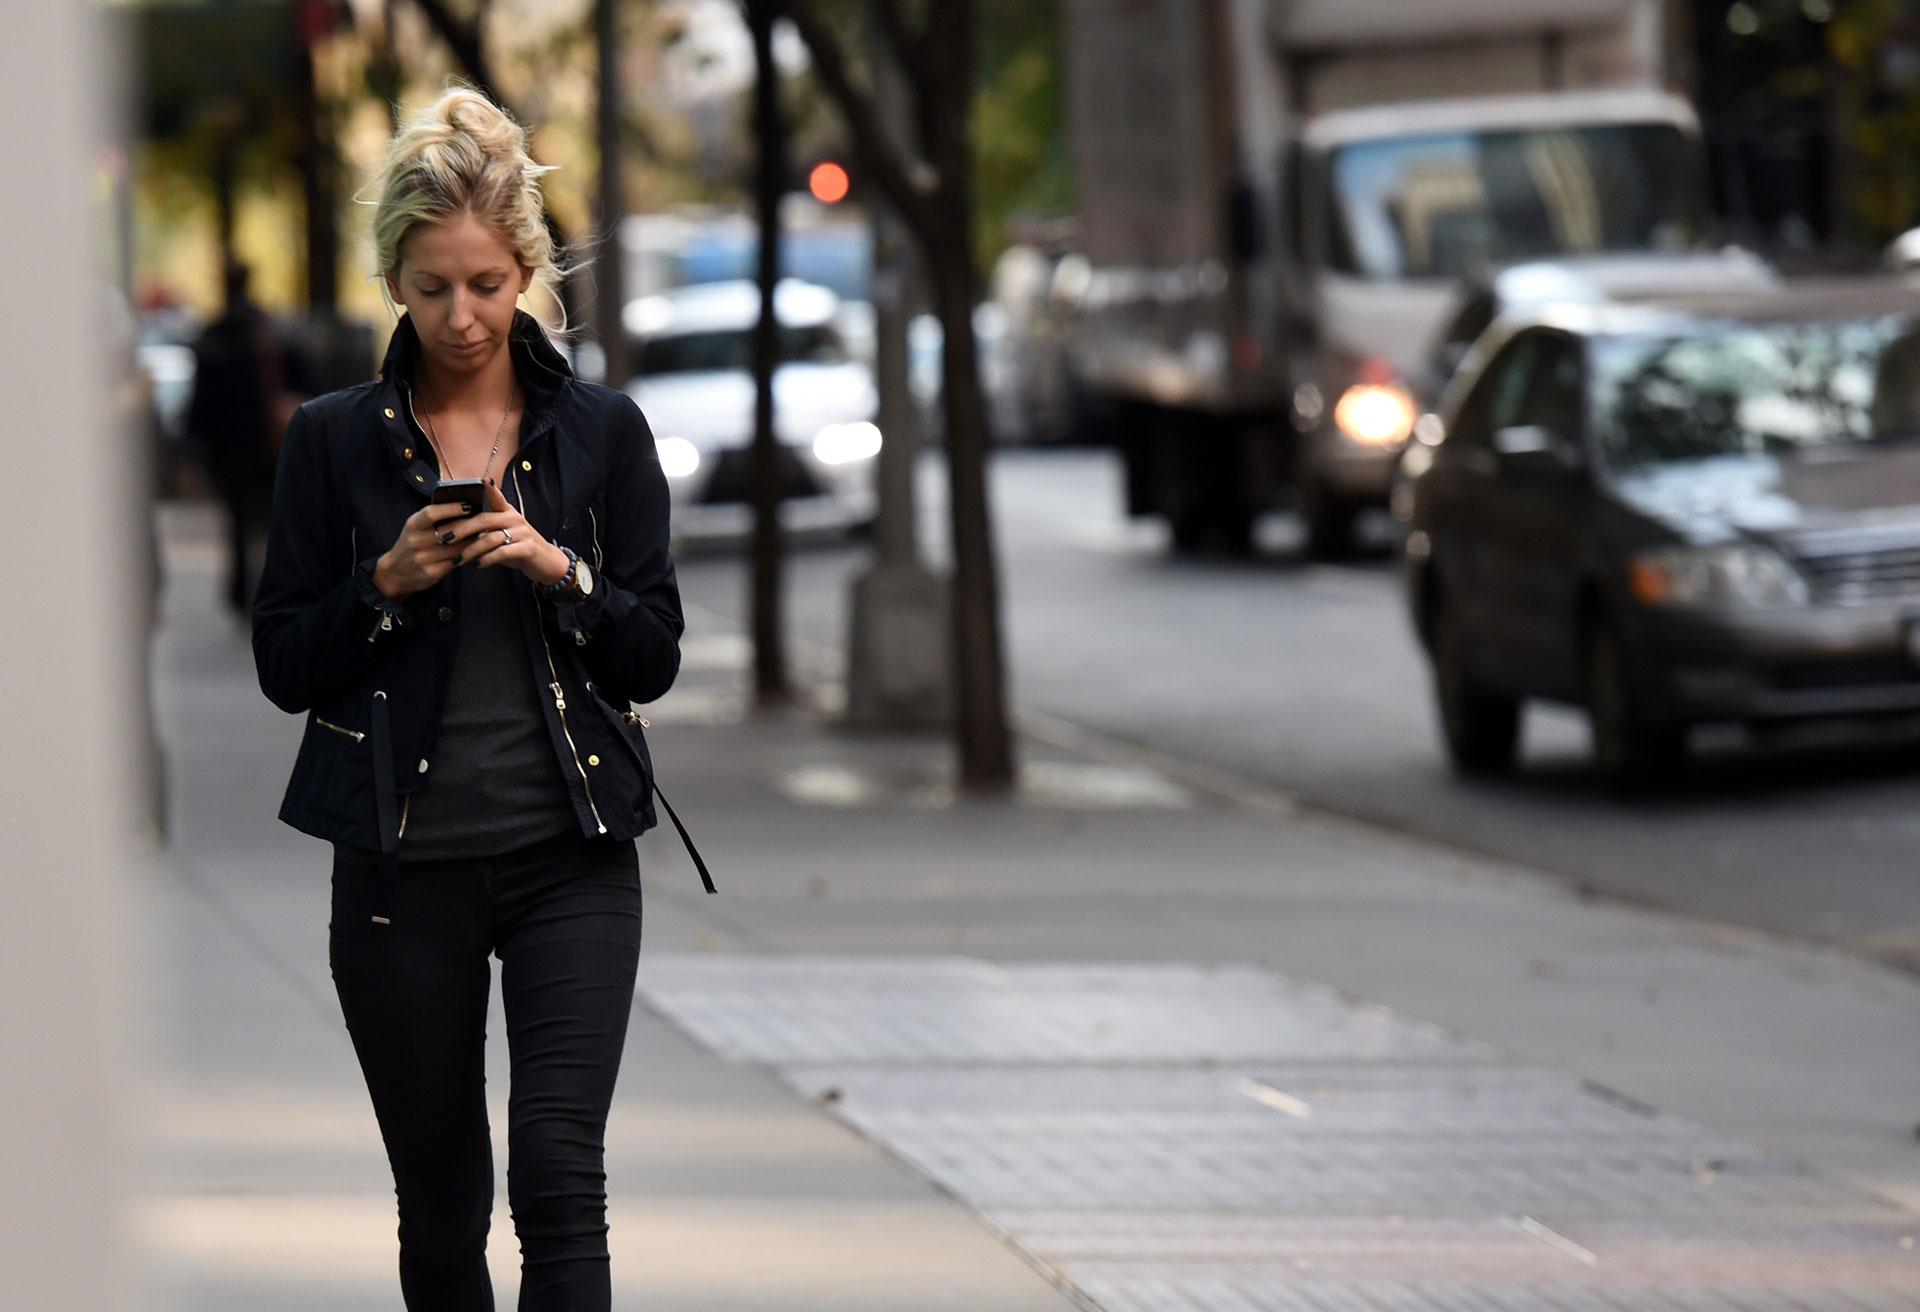 A pedestrian uses a smartphone